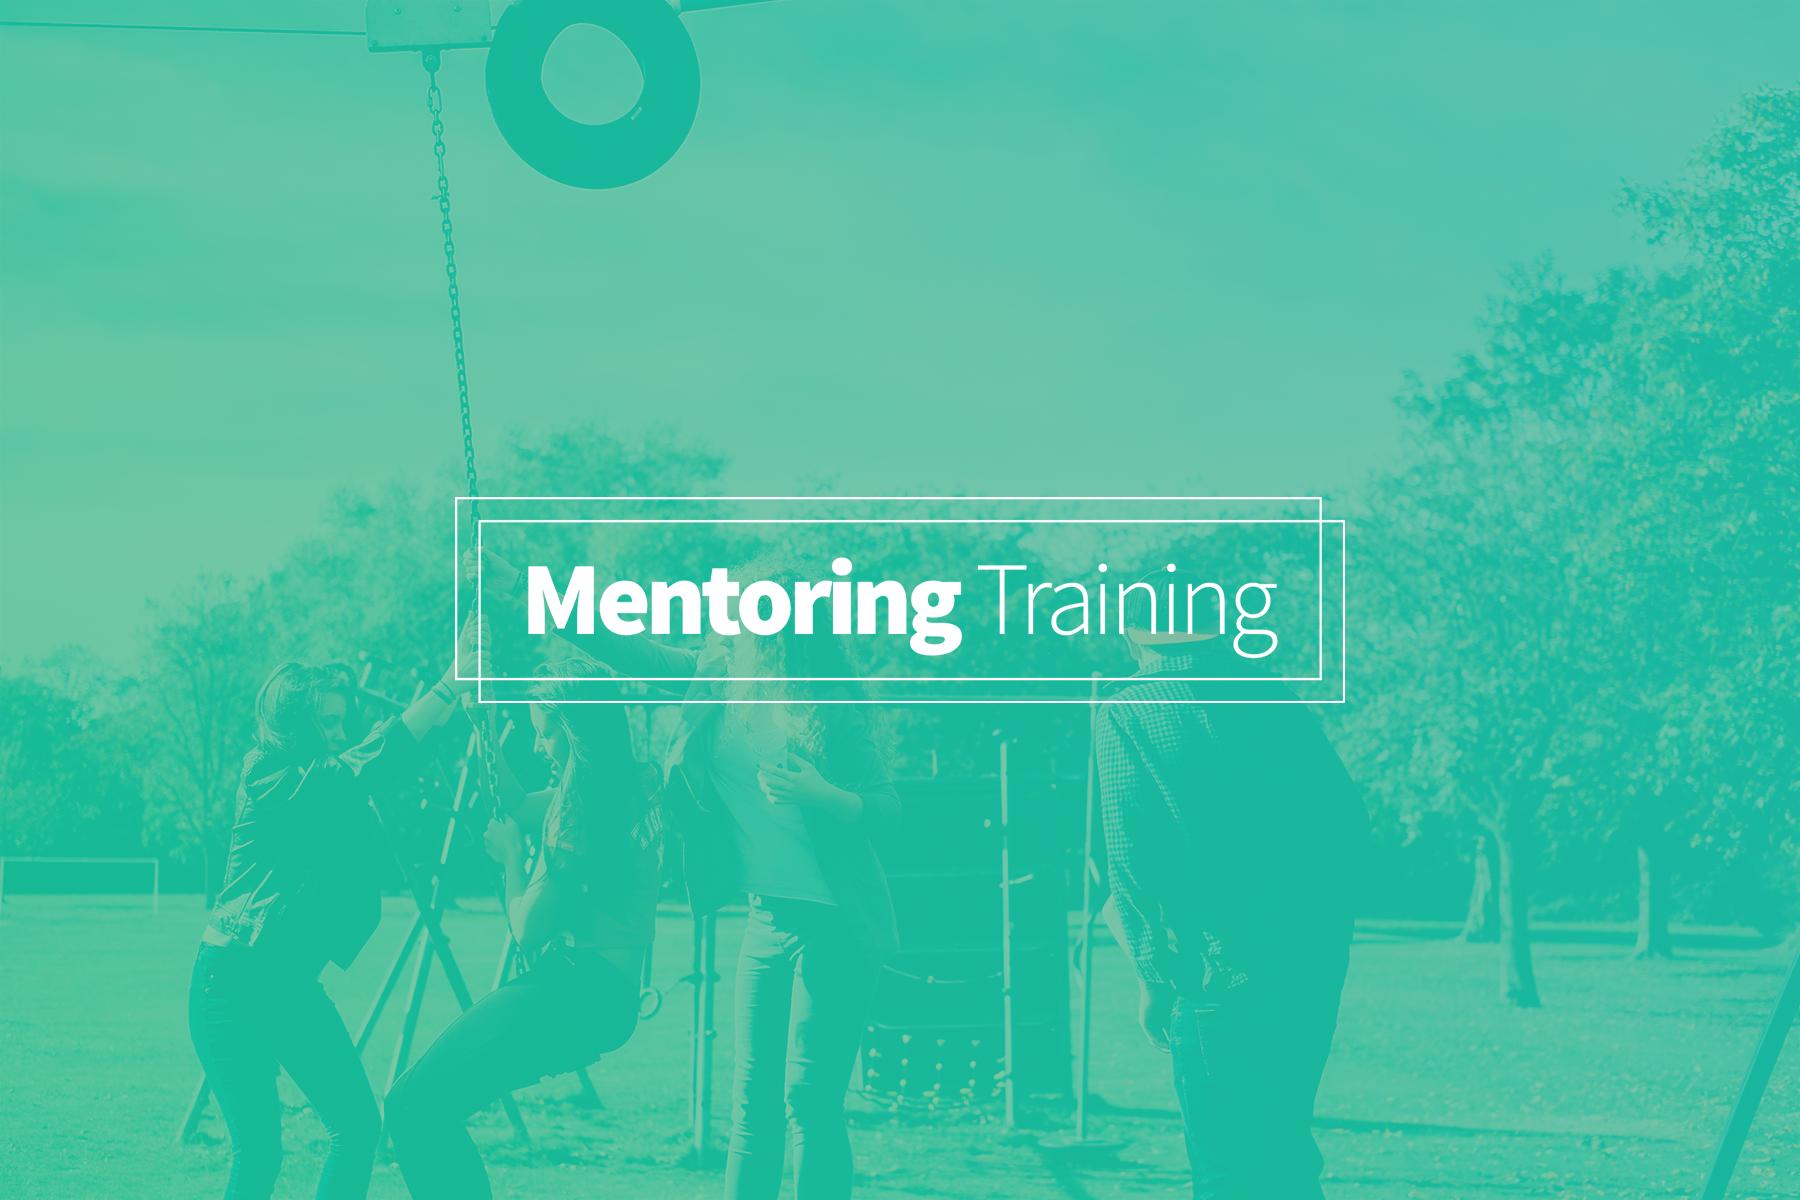 mentoringtraining_web.png